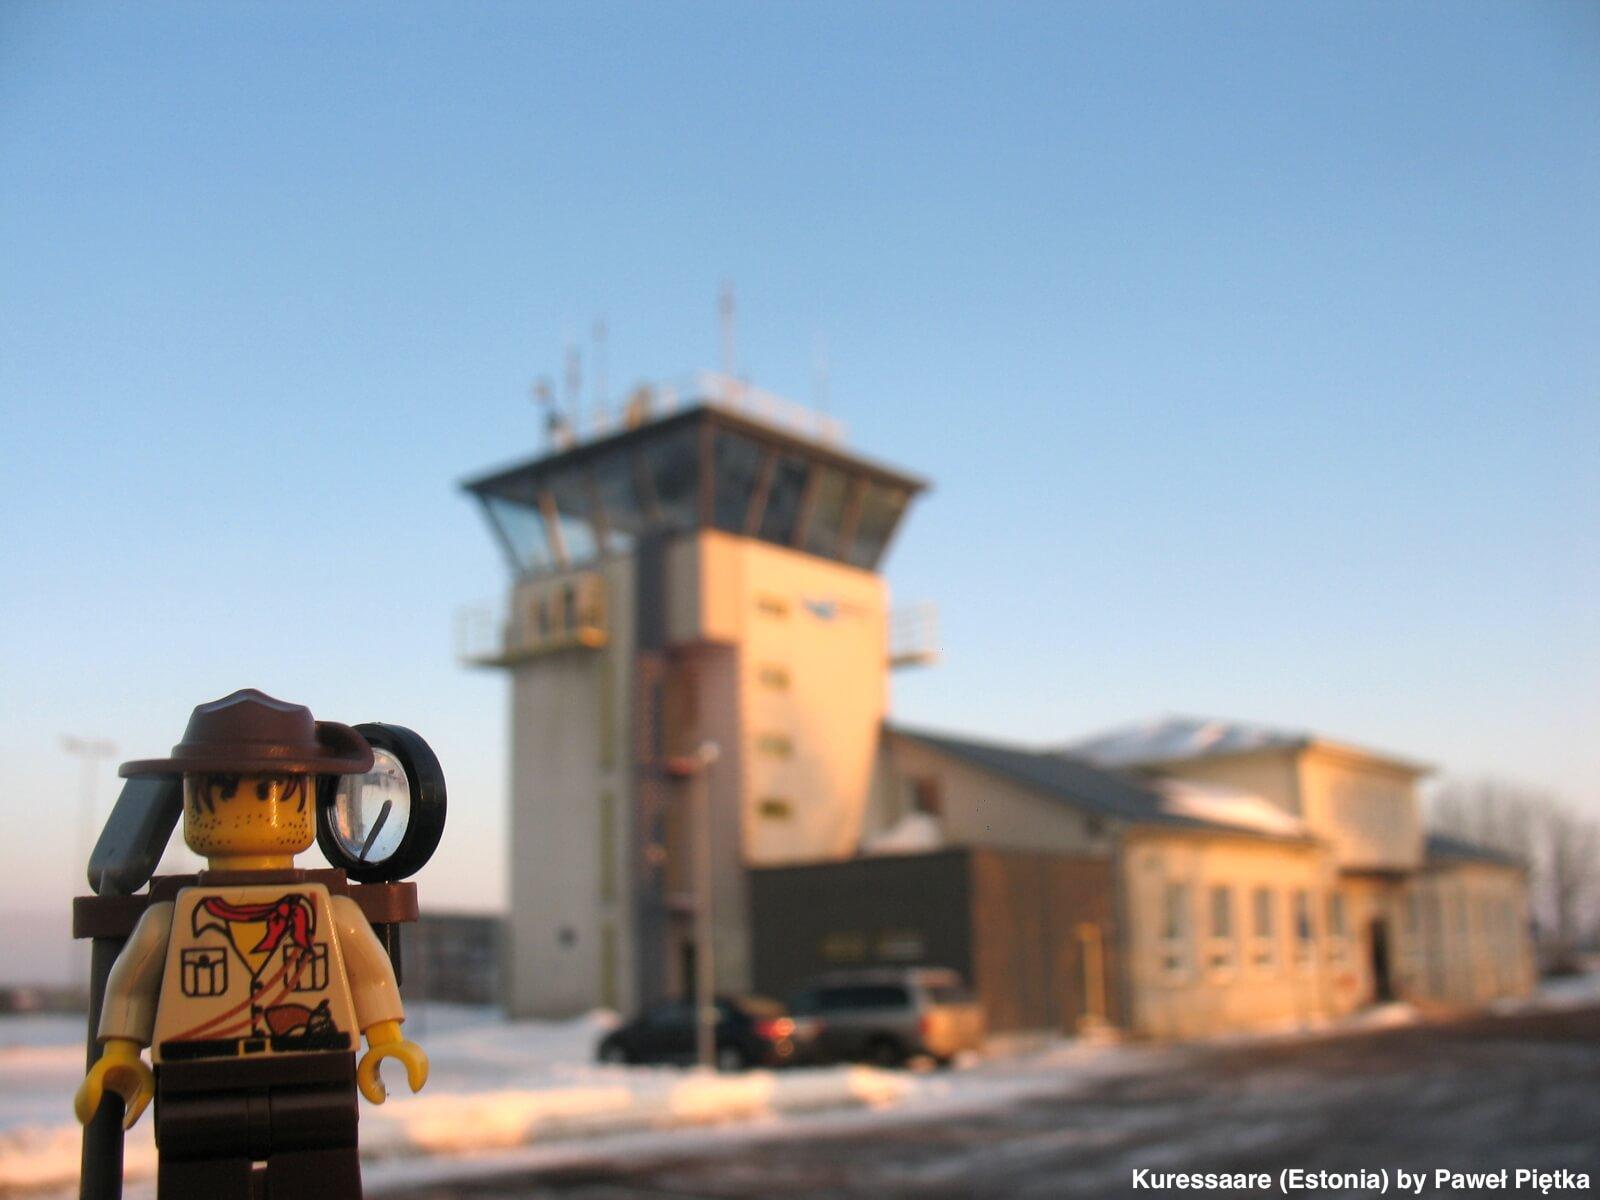 Kuressaare (Estonia) - Kuressaare Airport